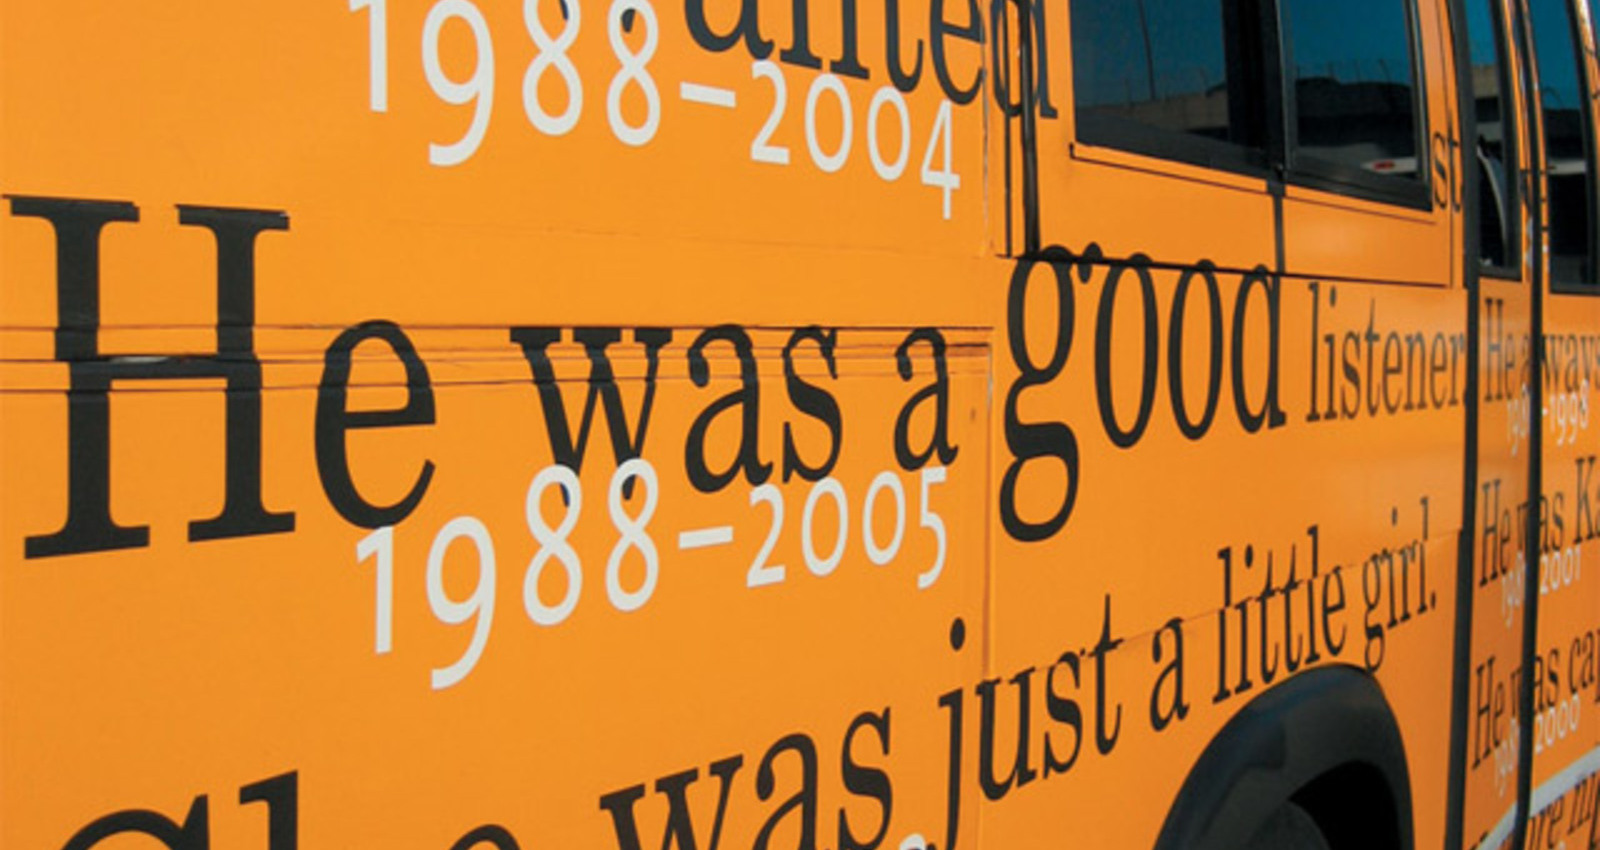 Remembering Boston's Children 1980-2005